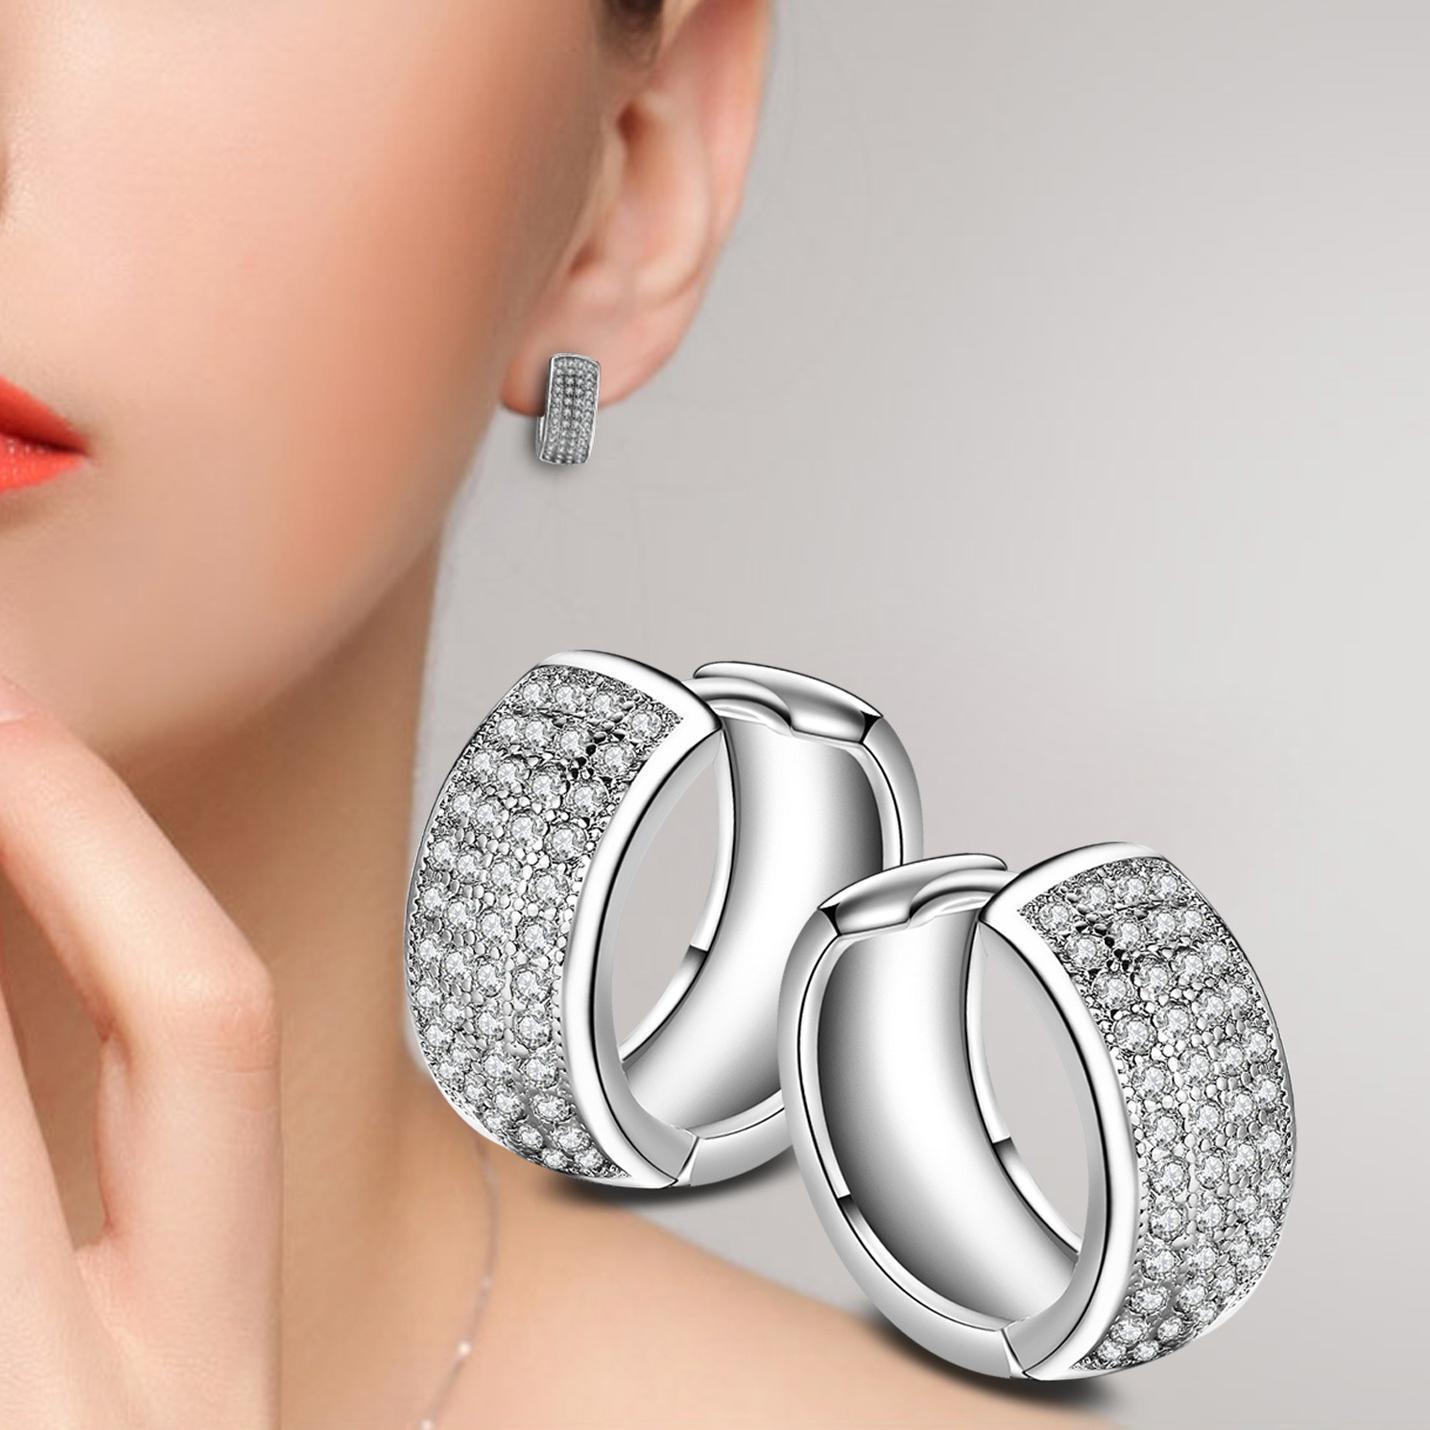 AAA Zircon Hoop Earrings For Women Earring Earings 925 Sterling Silver Jewelry Earing Brincos Brinco Oorbellen Pendientes Gift F